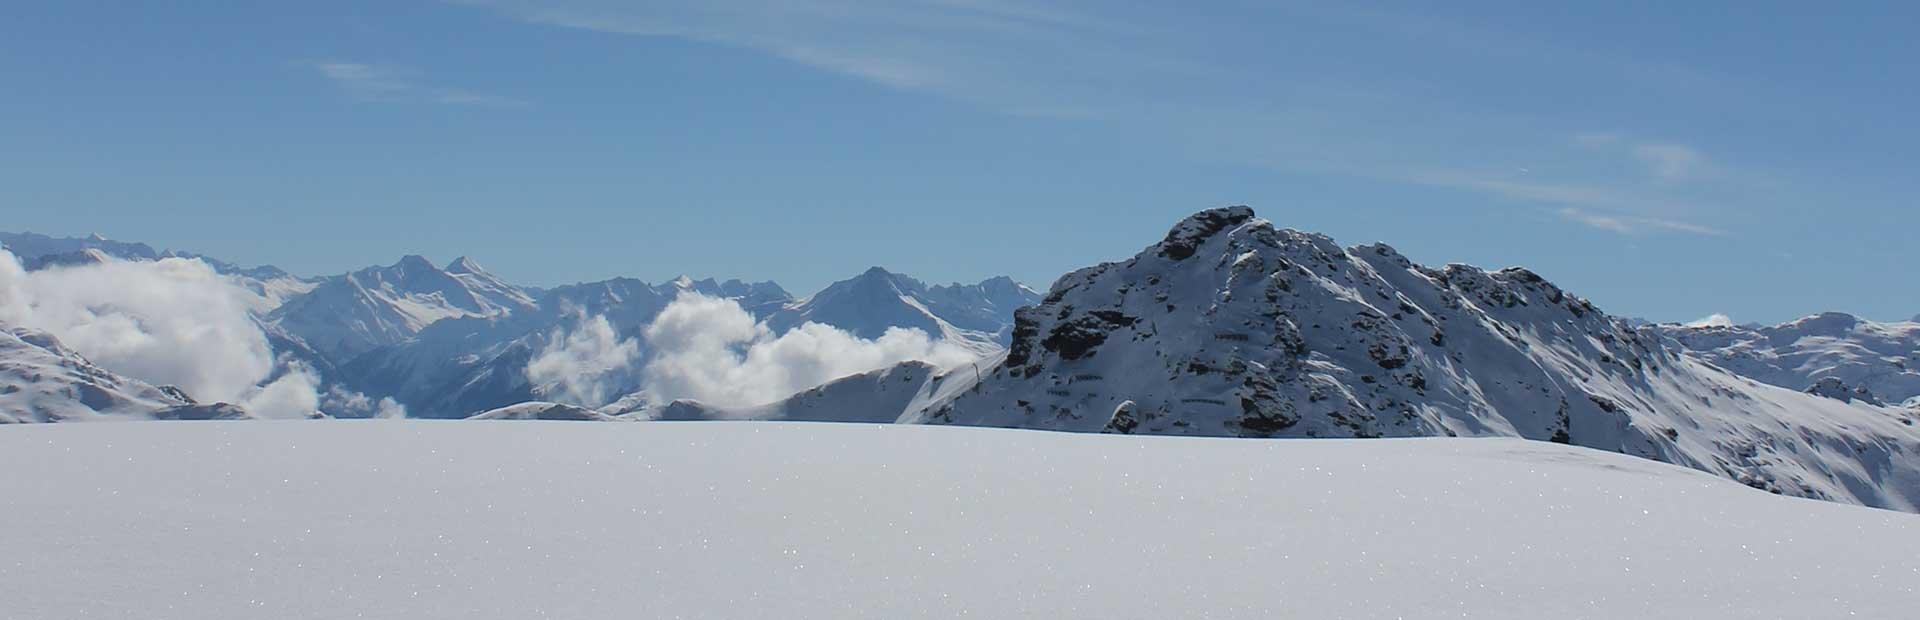 Freeride Tiefschnee Powder Tirol Skigebiet